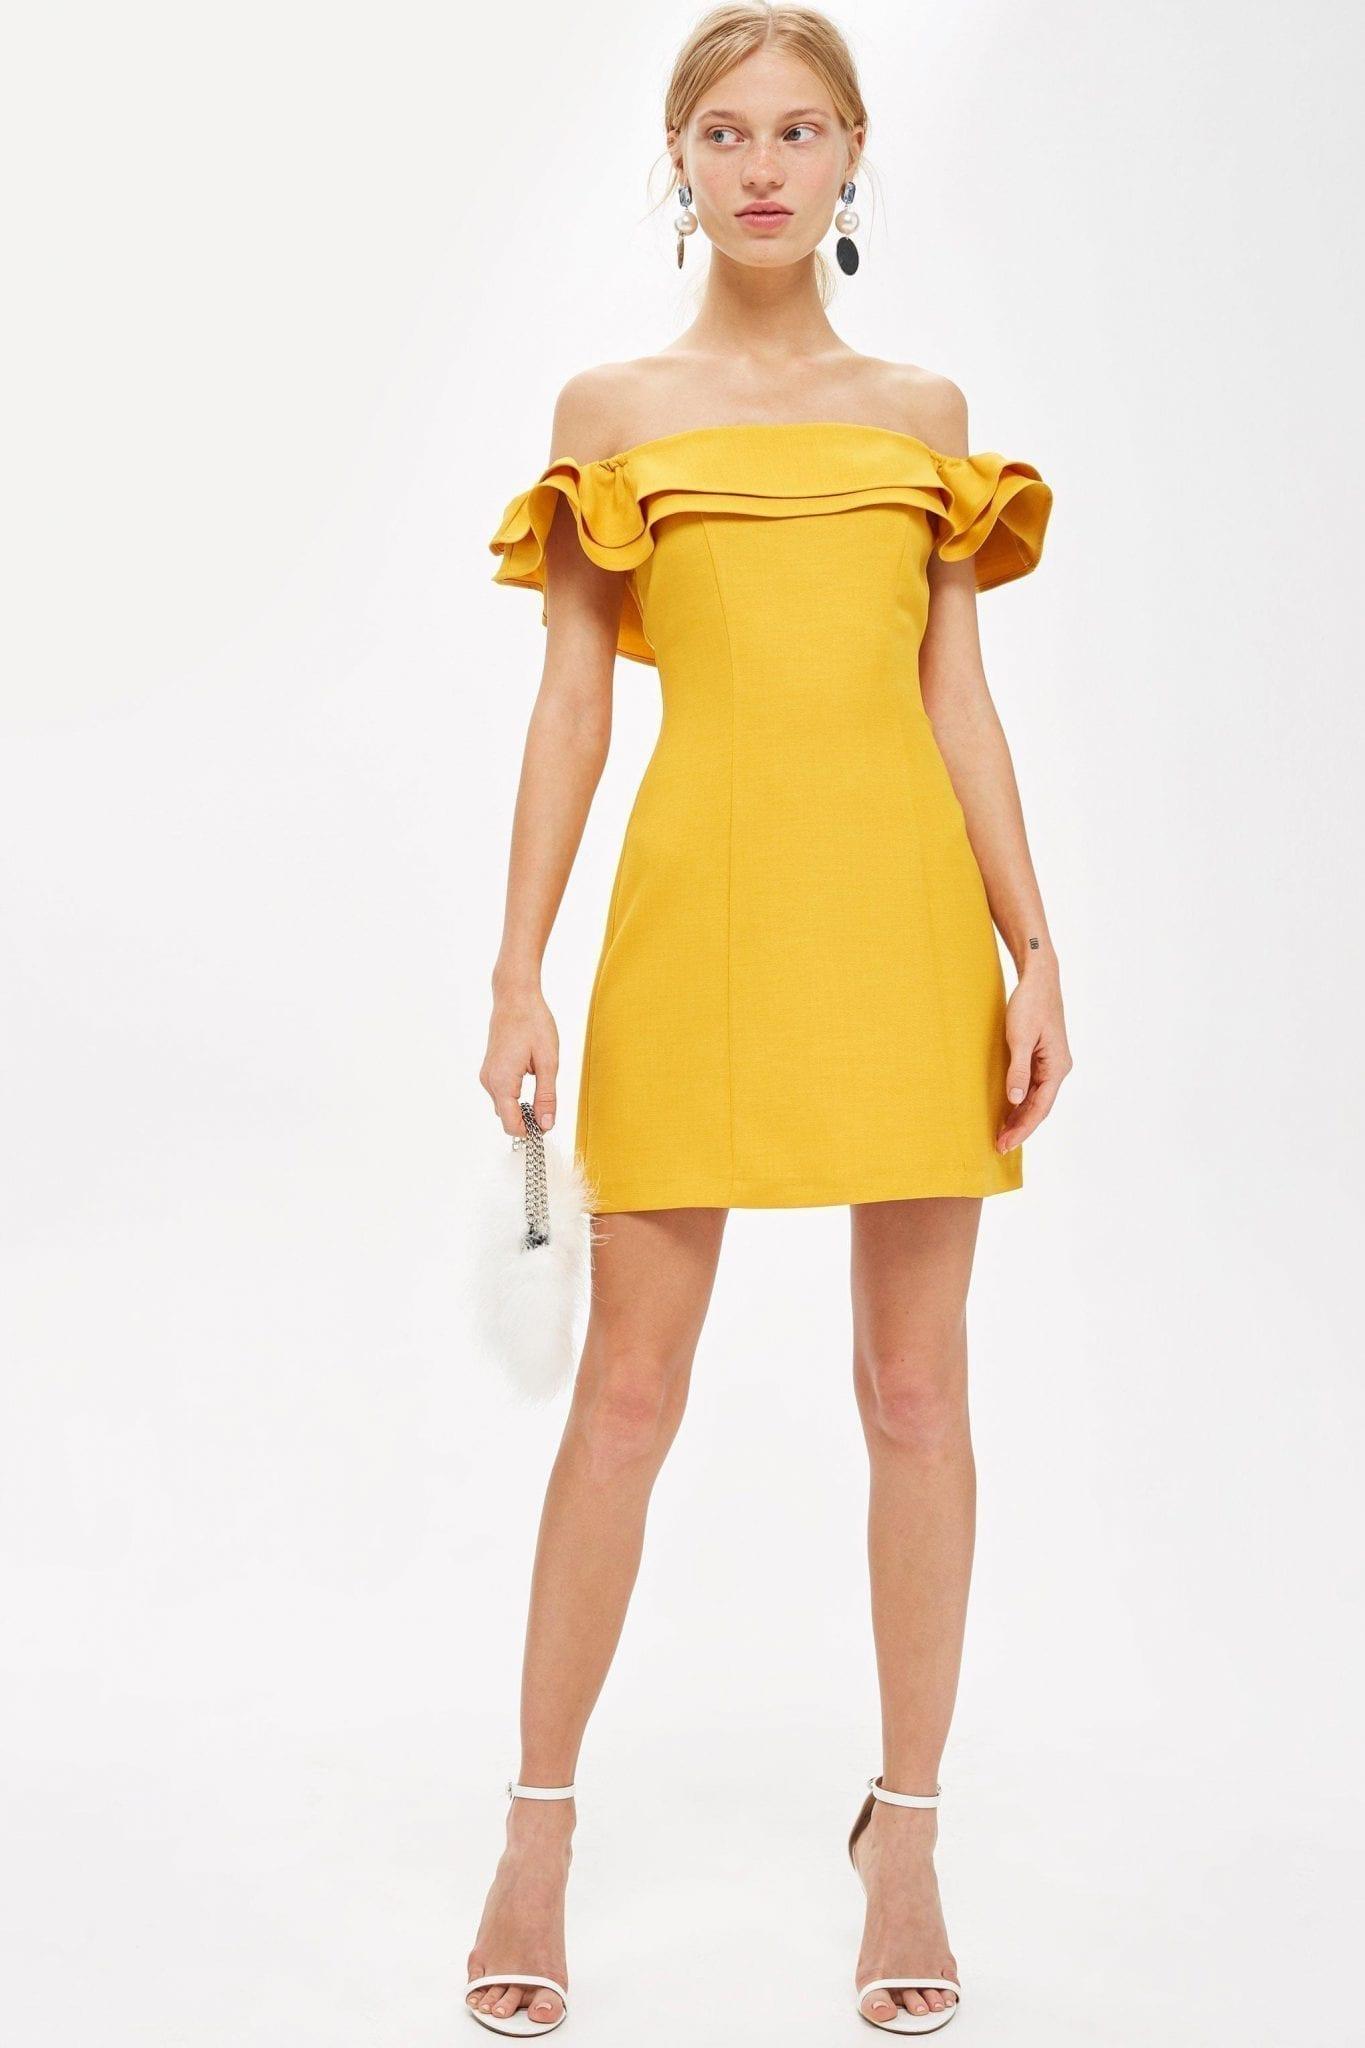 TOPSHOP Tall Ruffle Bardot Mini Yellow Dress